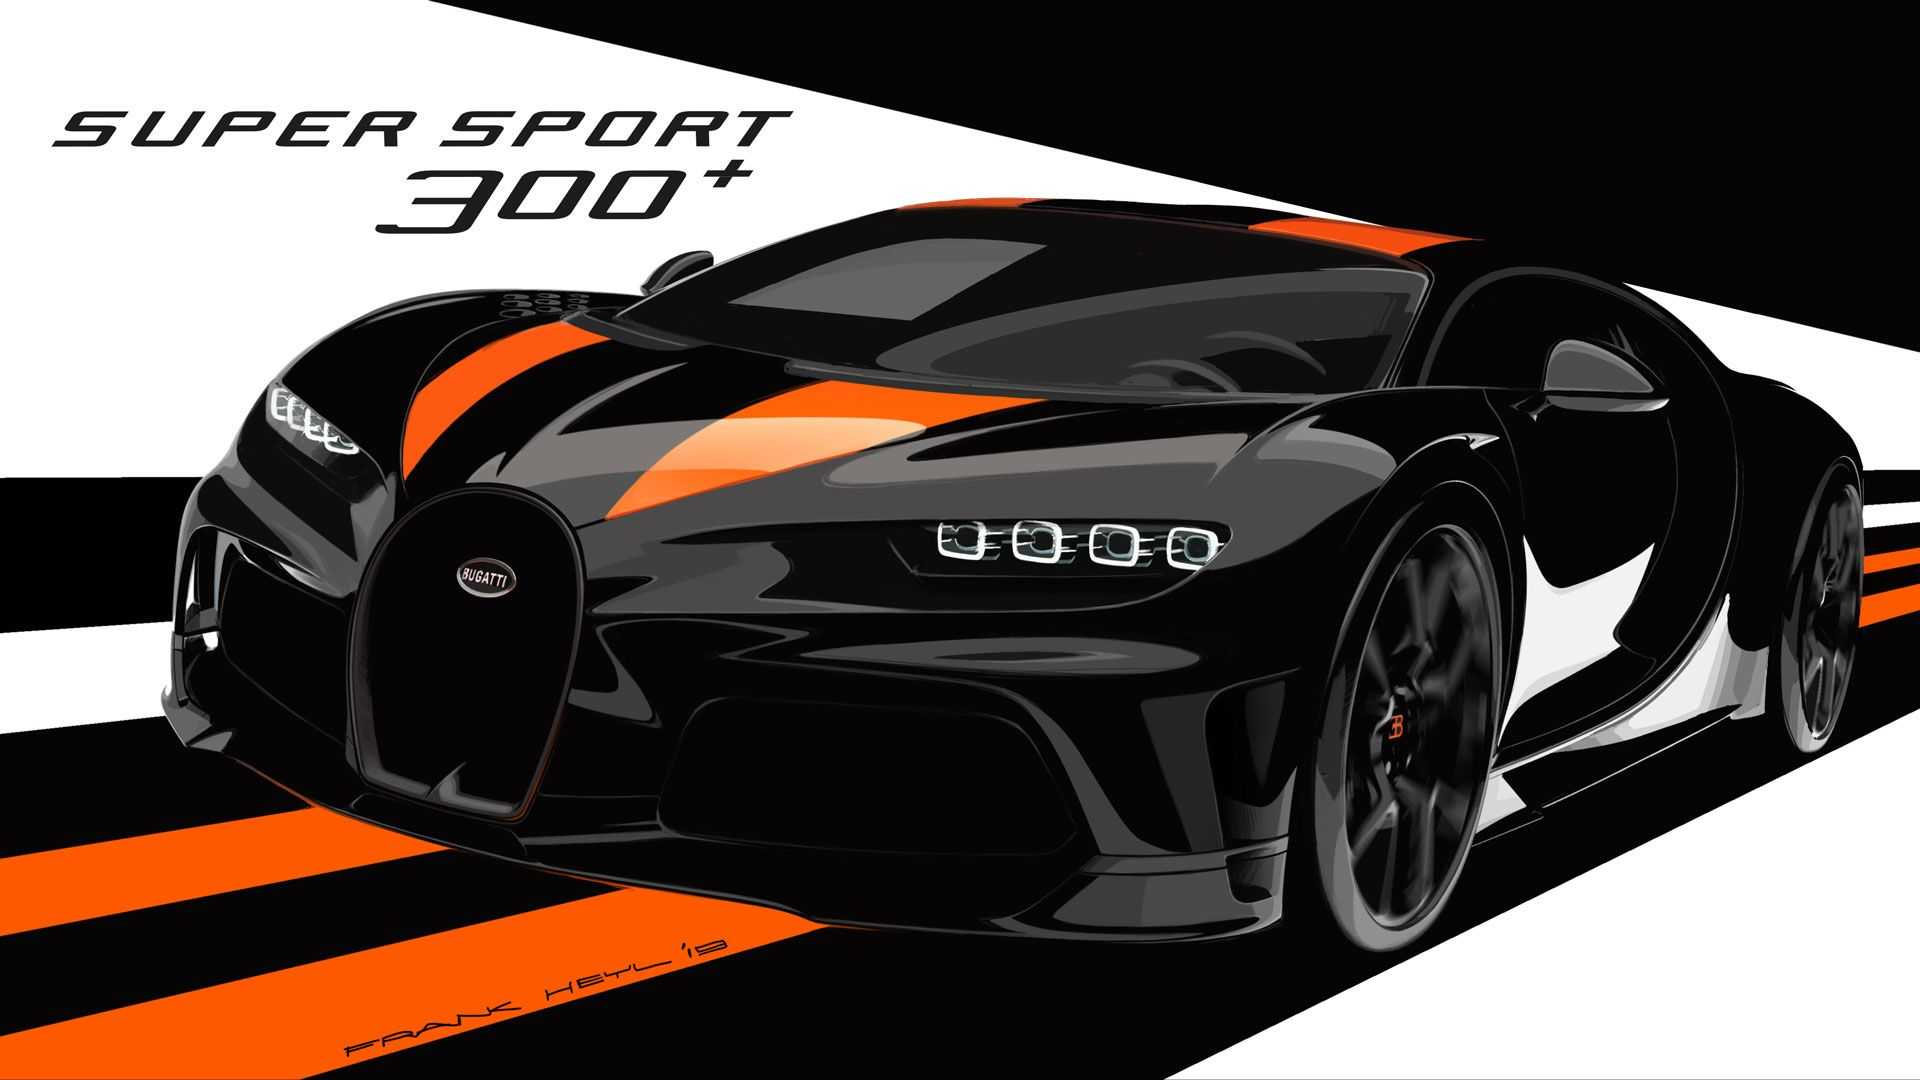 Bugatti Super Sport 300+